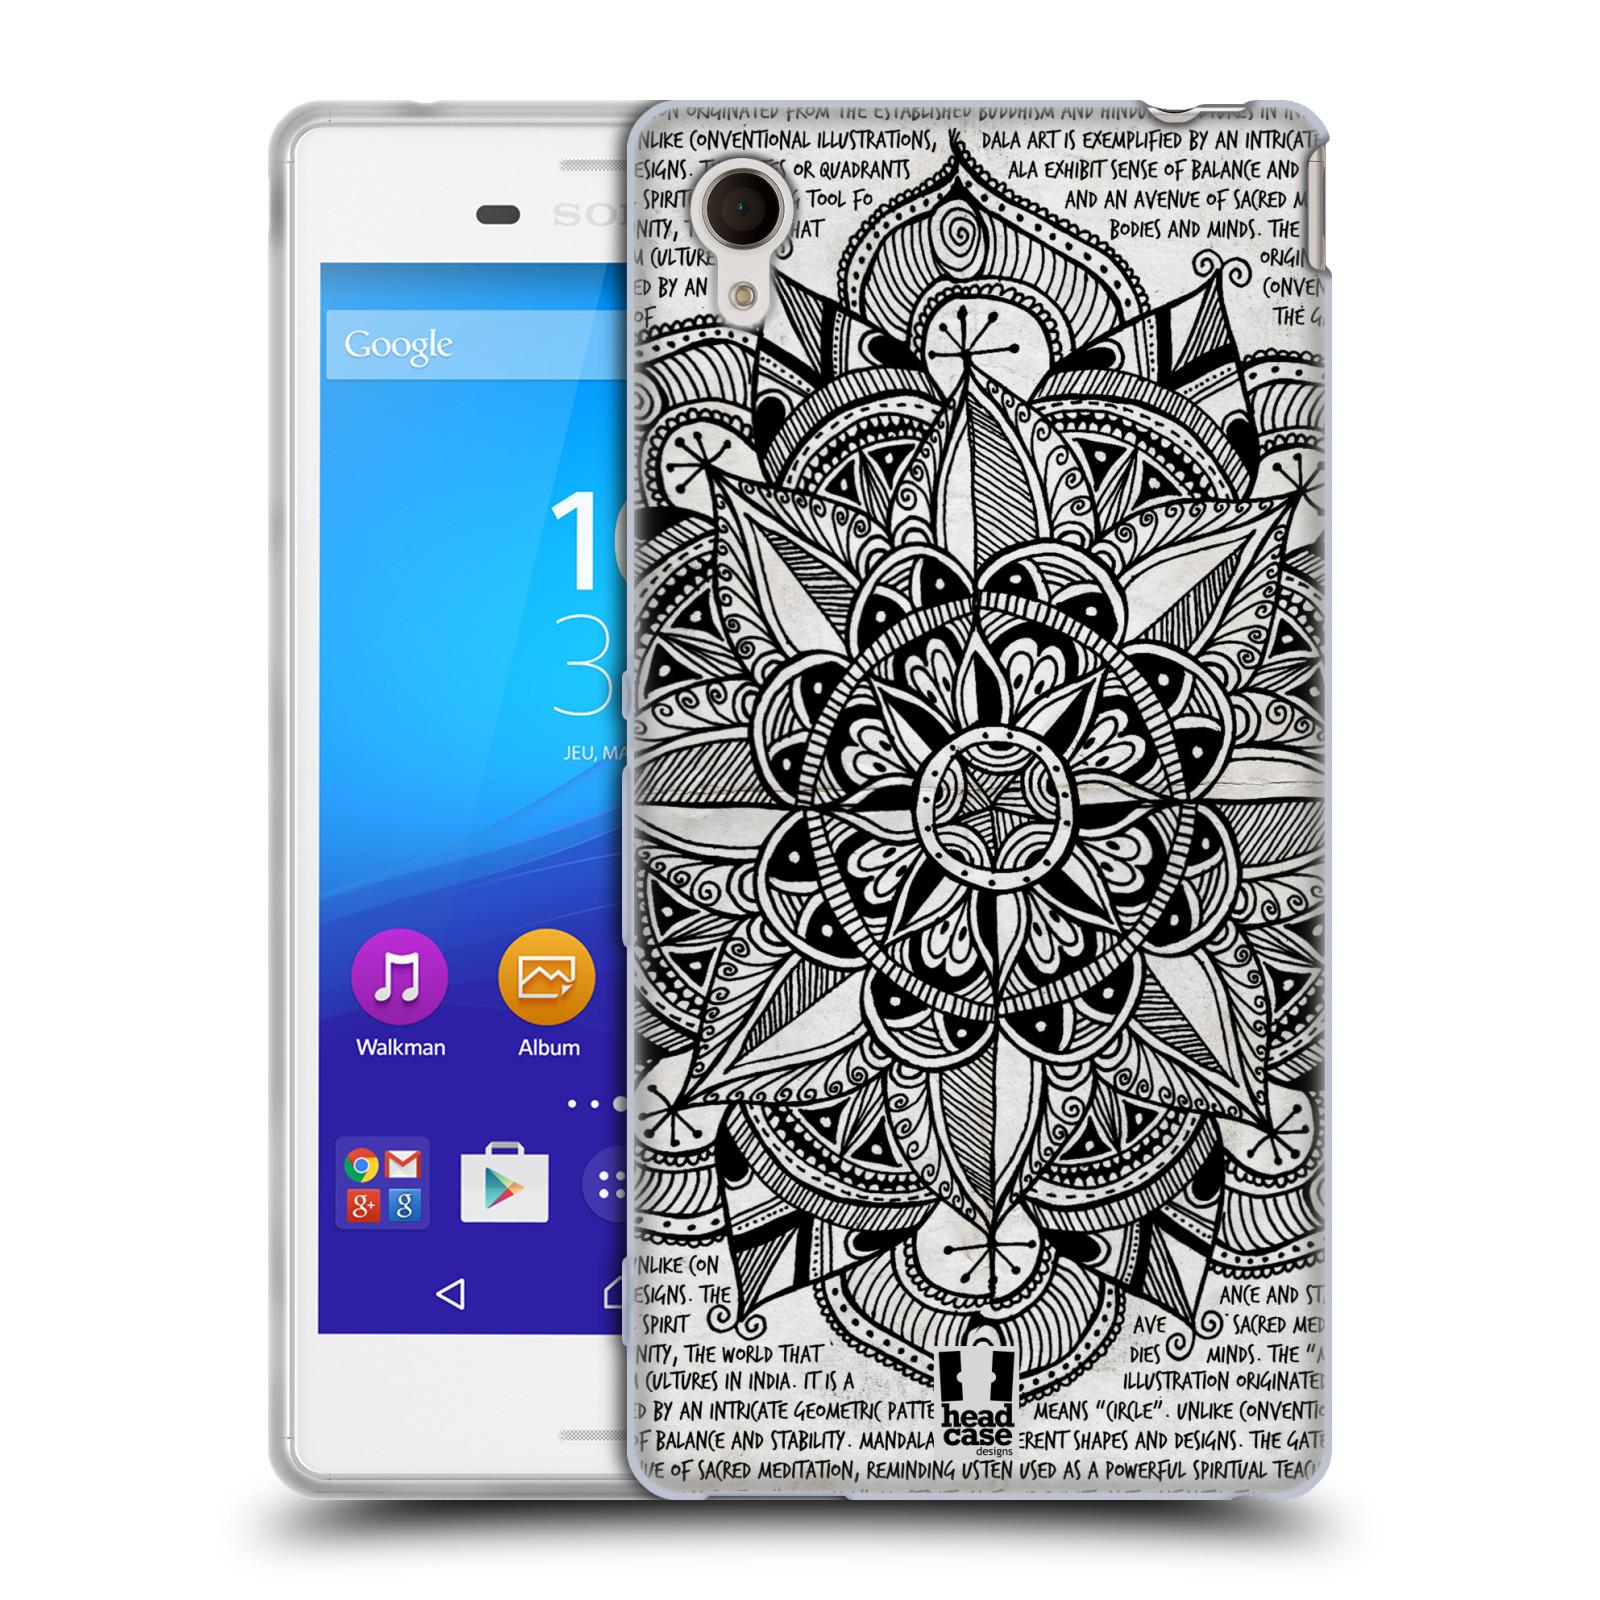 Silikonové pouzdro na mobil Sony Xperia M4 Aqua E2303 HEAD CASE Mandala Doodle Paper (Silikonový kryt či obal na mobilní telefon Sony Xperia M4 Aqua a M4 Aqua Dual SIM)